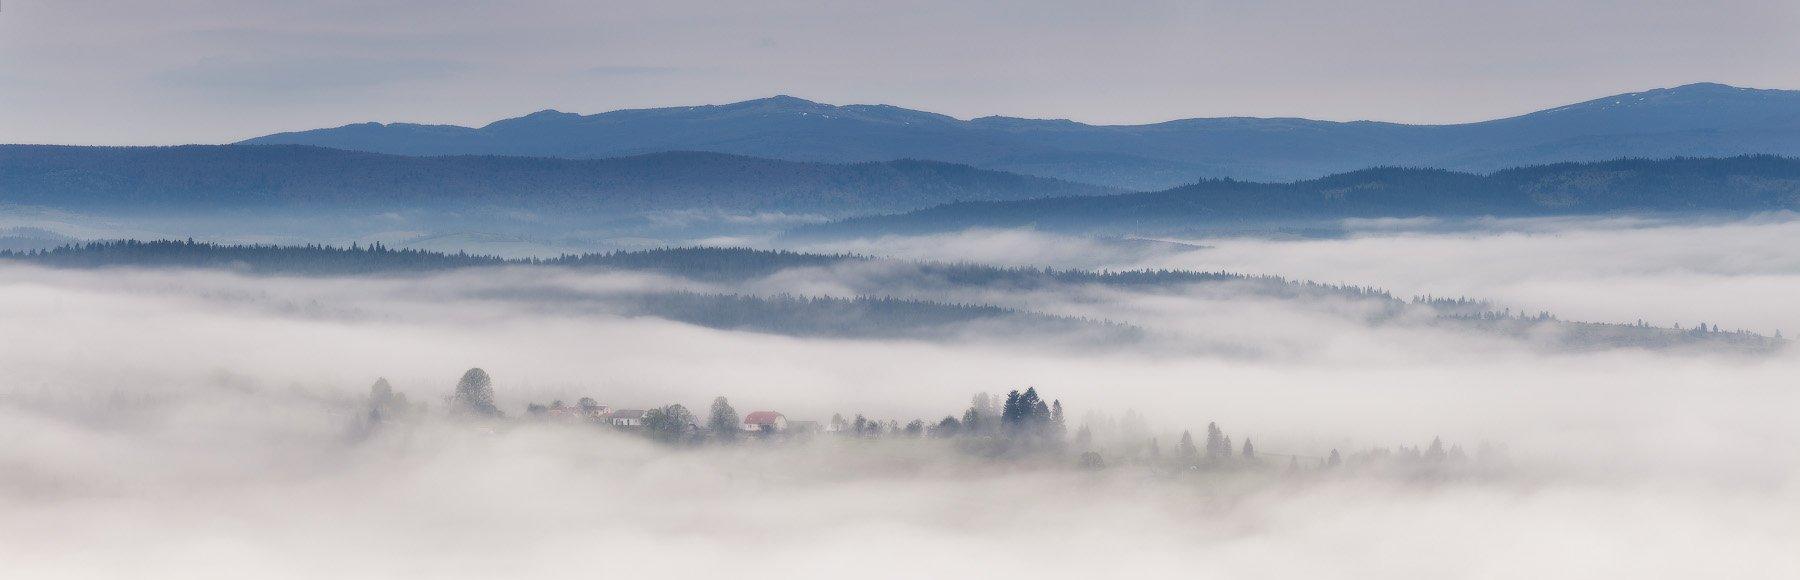 весна, горы, карпаты, май, туман, утро, Вейзе Максим